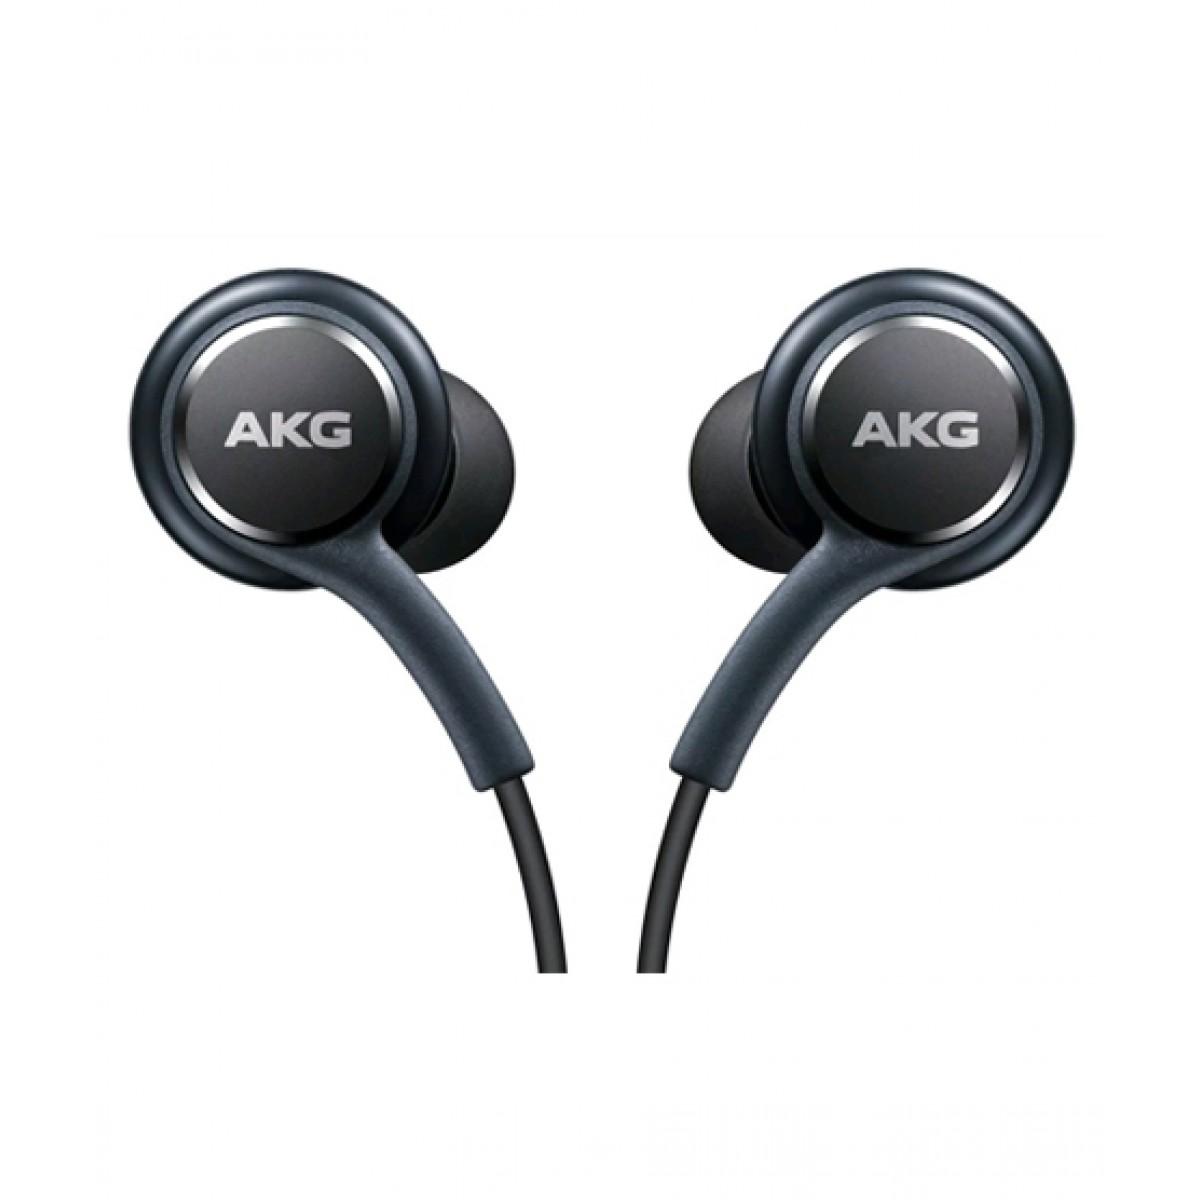 Samsung Earphones Price In Pakistan Buy Samsung Tuned By Akg Grey Eo Ig955 Ishopping Pk